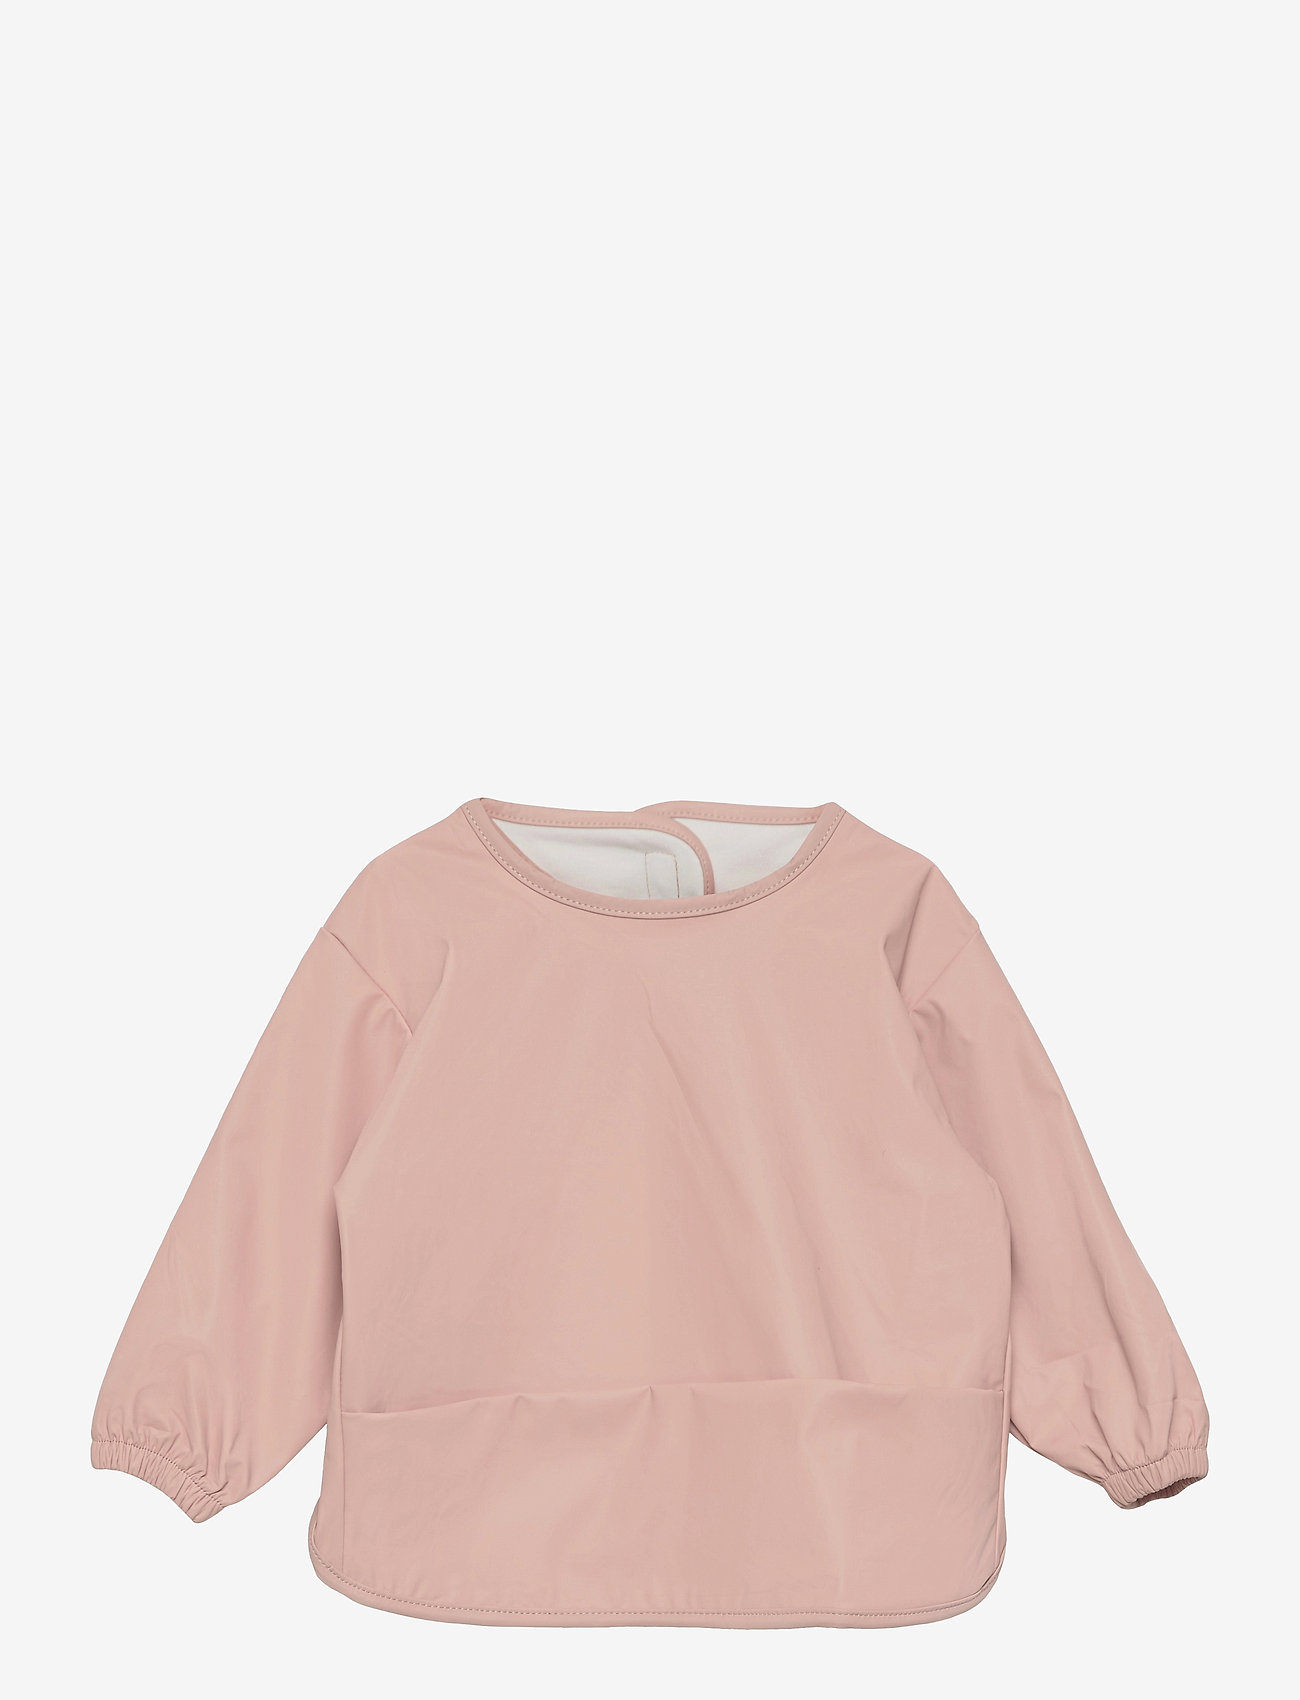 Melton - Blouse solid colour - Śliniaczek - rose - 0